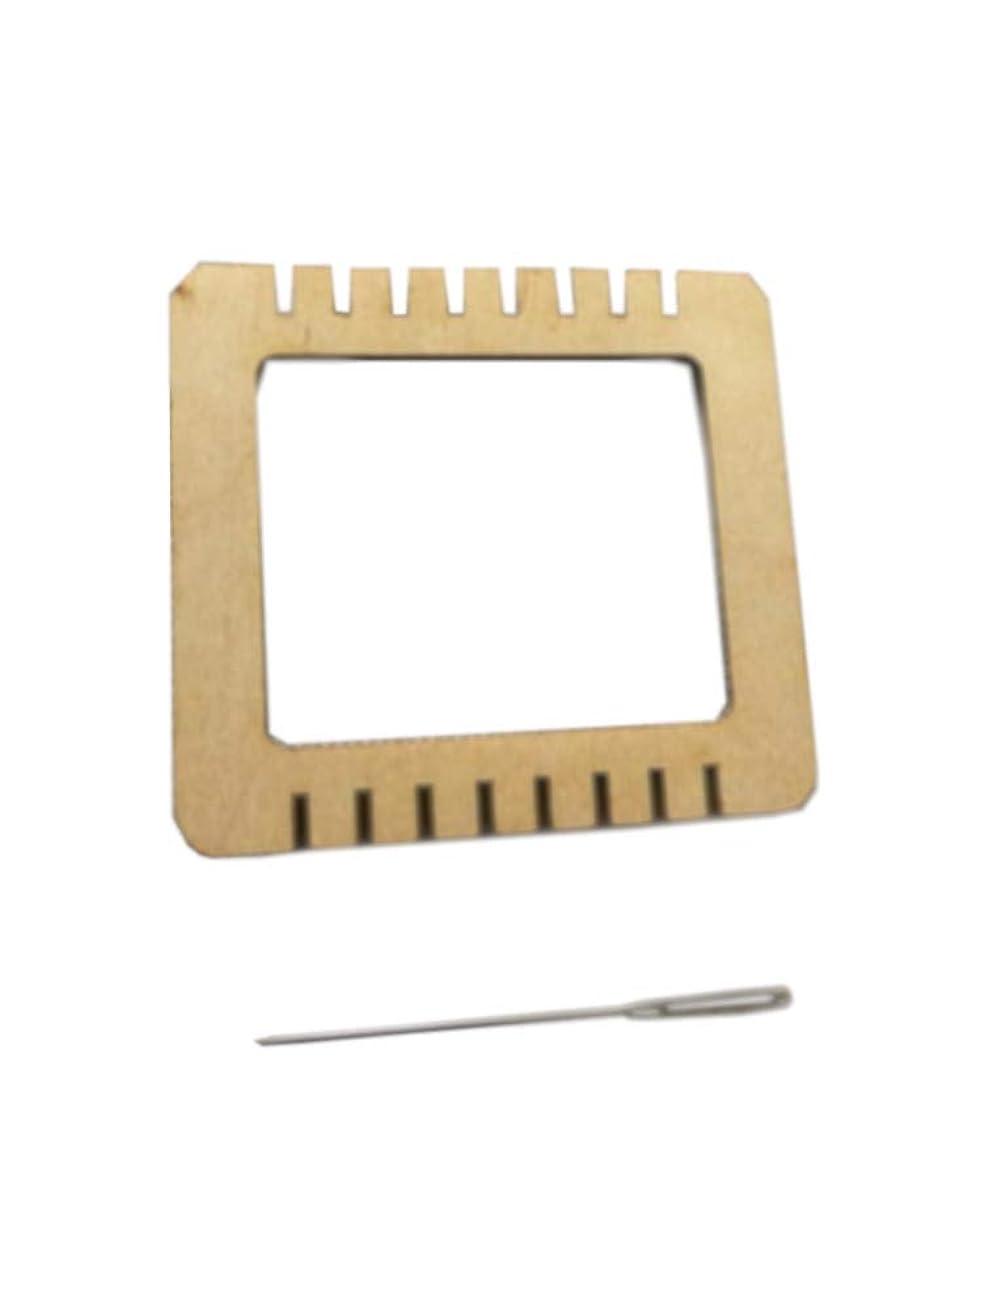 Purl & Loop Minute Weaver Micro Mini Weaving Loom (Extra Fine / 20 EPI)